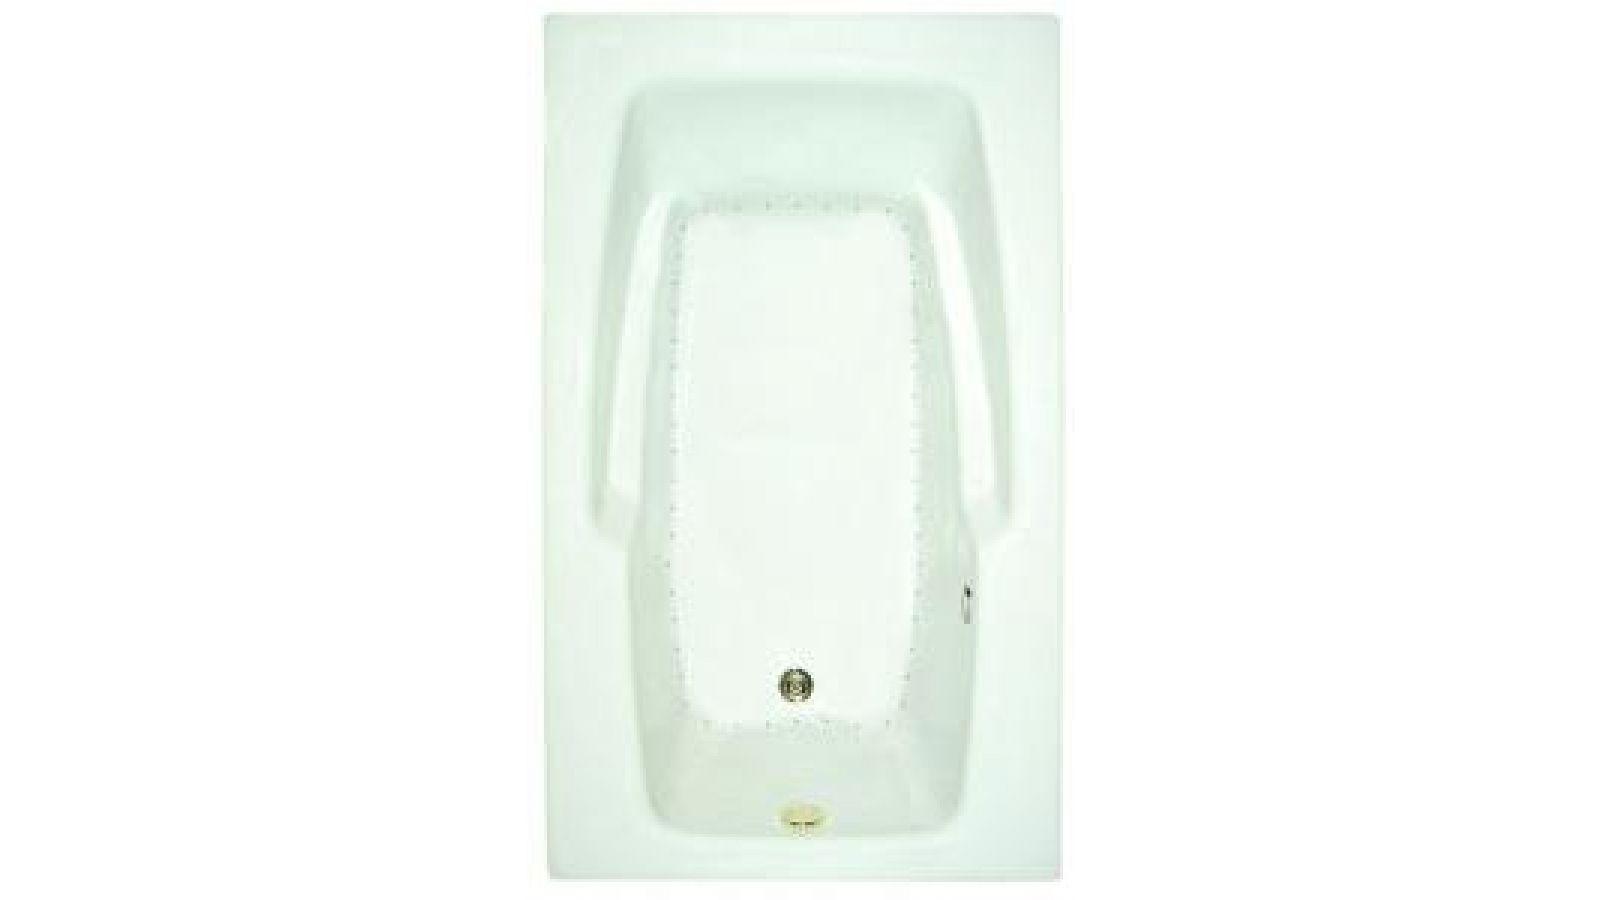 Pro-Fit 3660 Rectangular Air Massage Bath